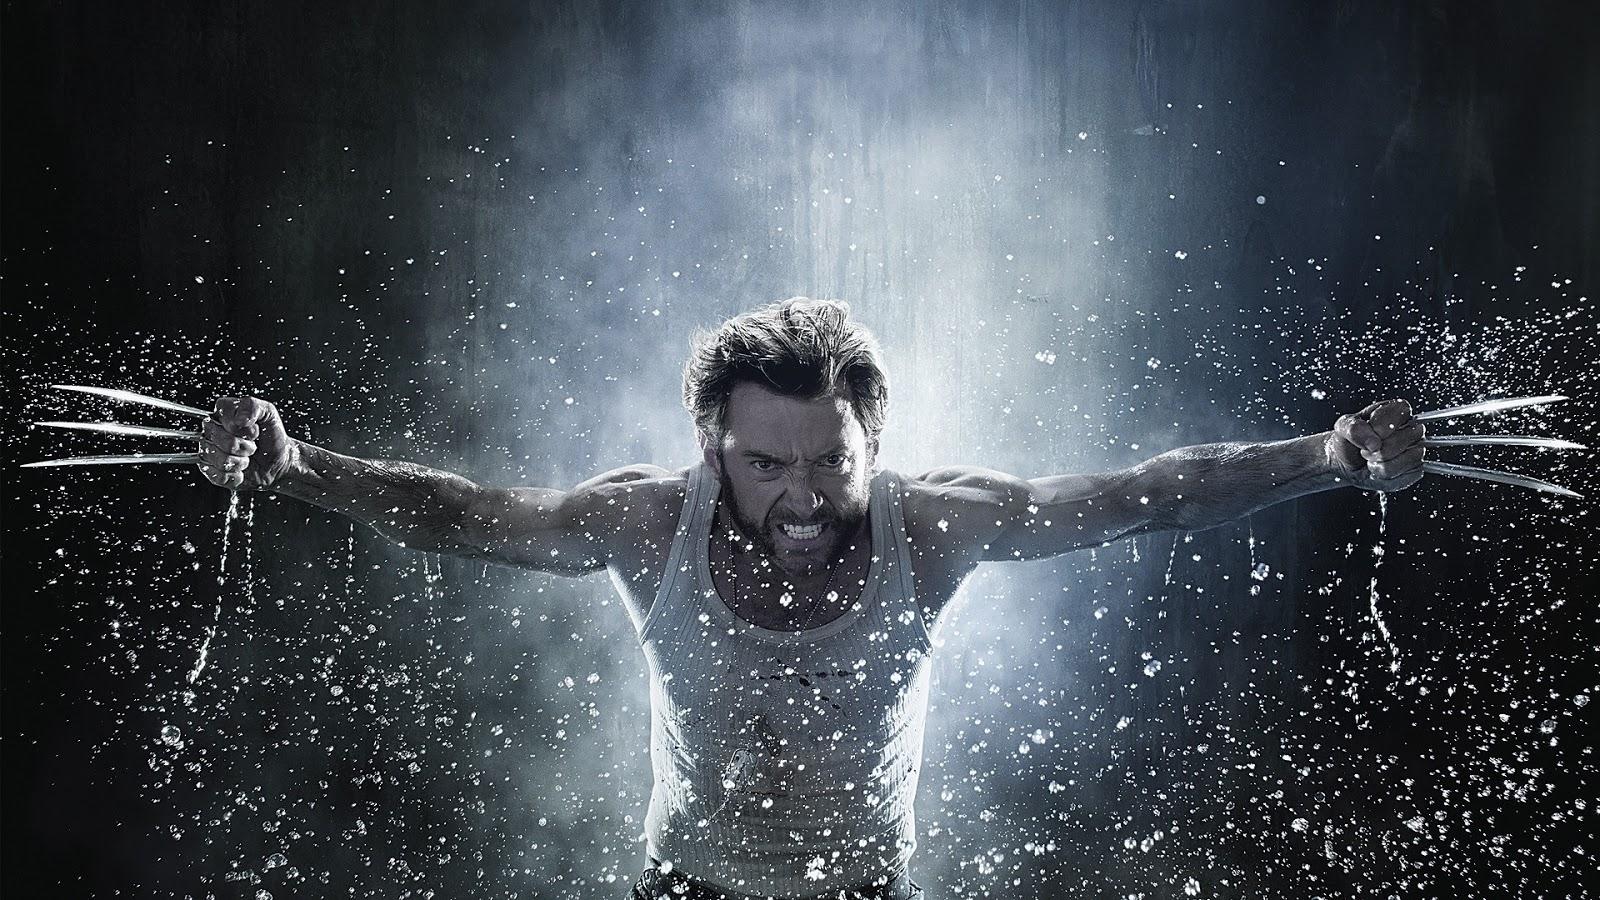 Man Wolverine 2 Full High Definition Wallpaper Download HD 1600x900